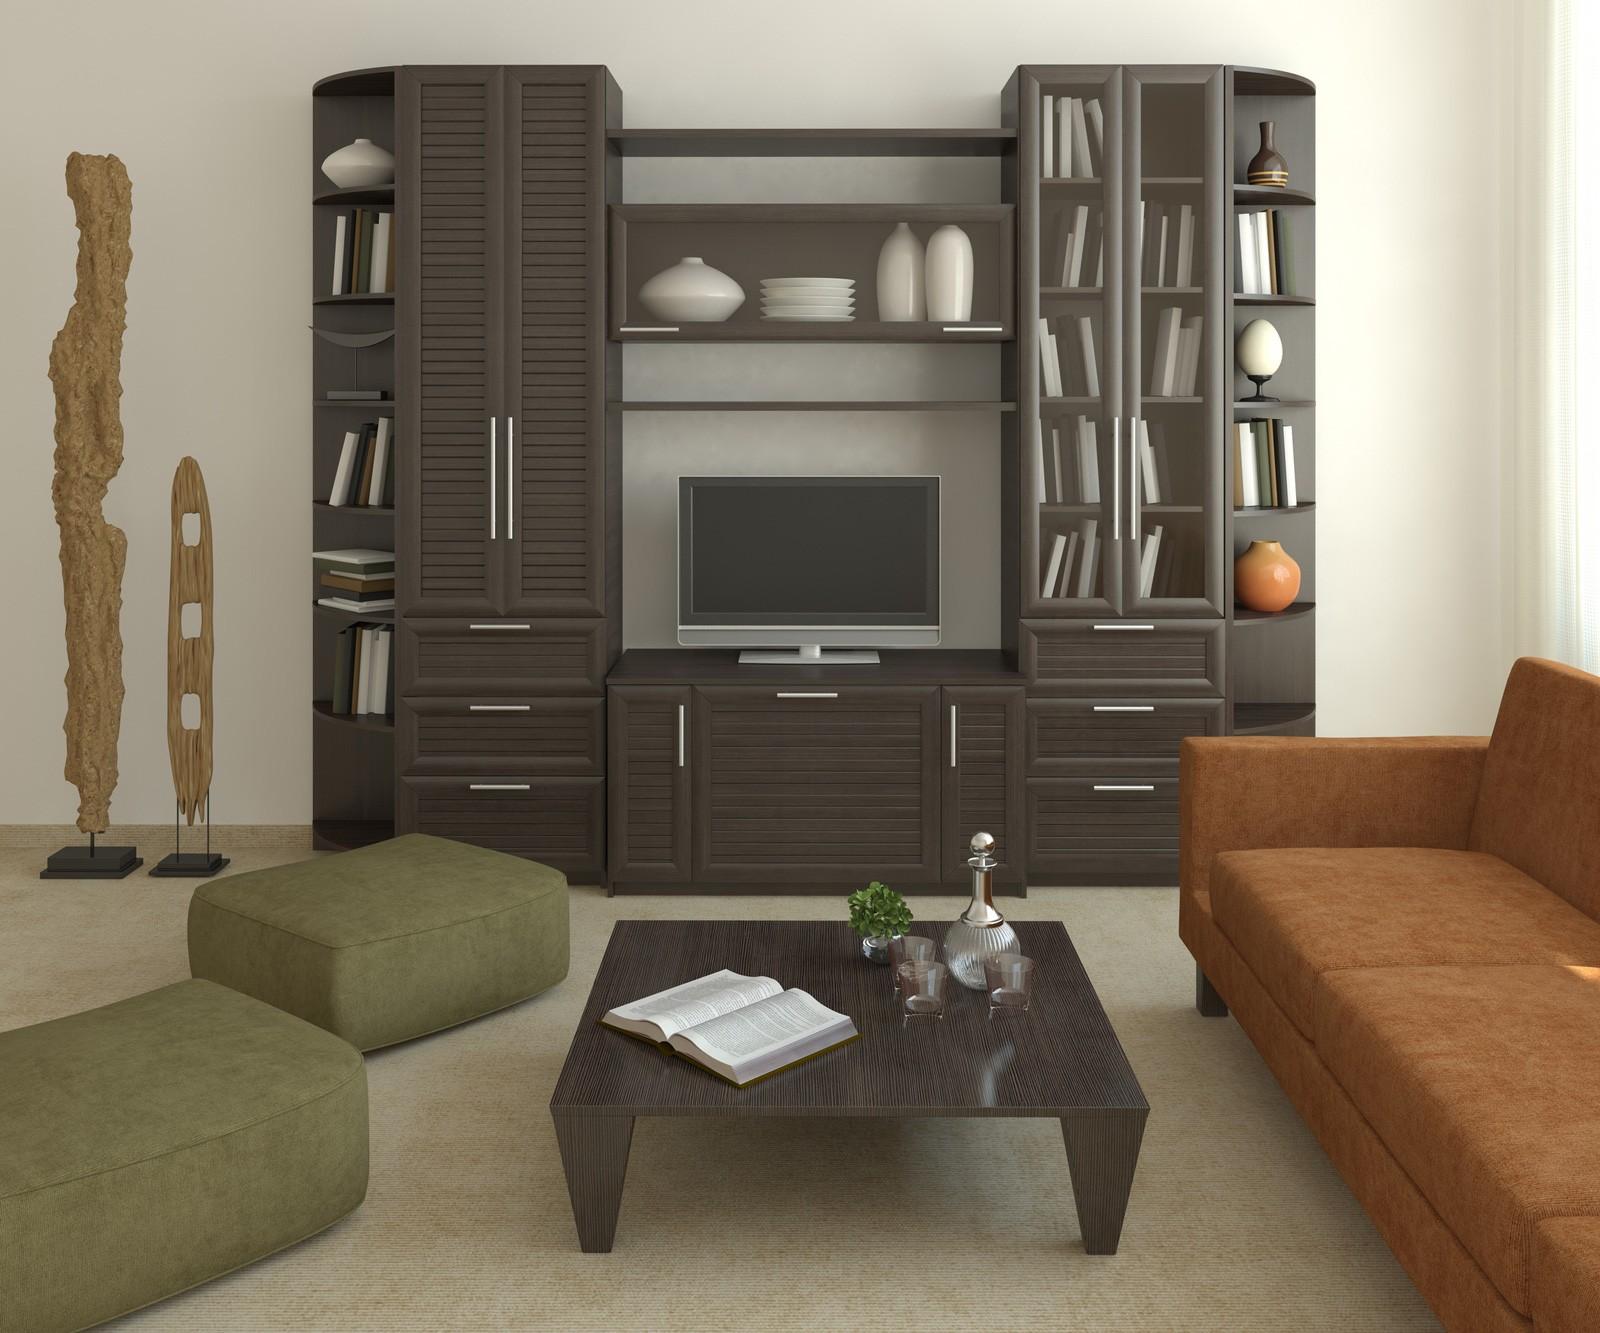 Drawn room dark corner  Style Zigzag Living Style